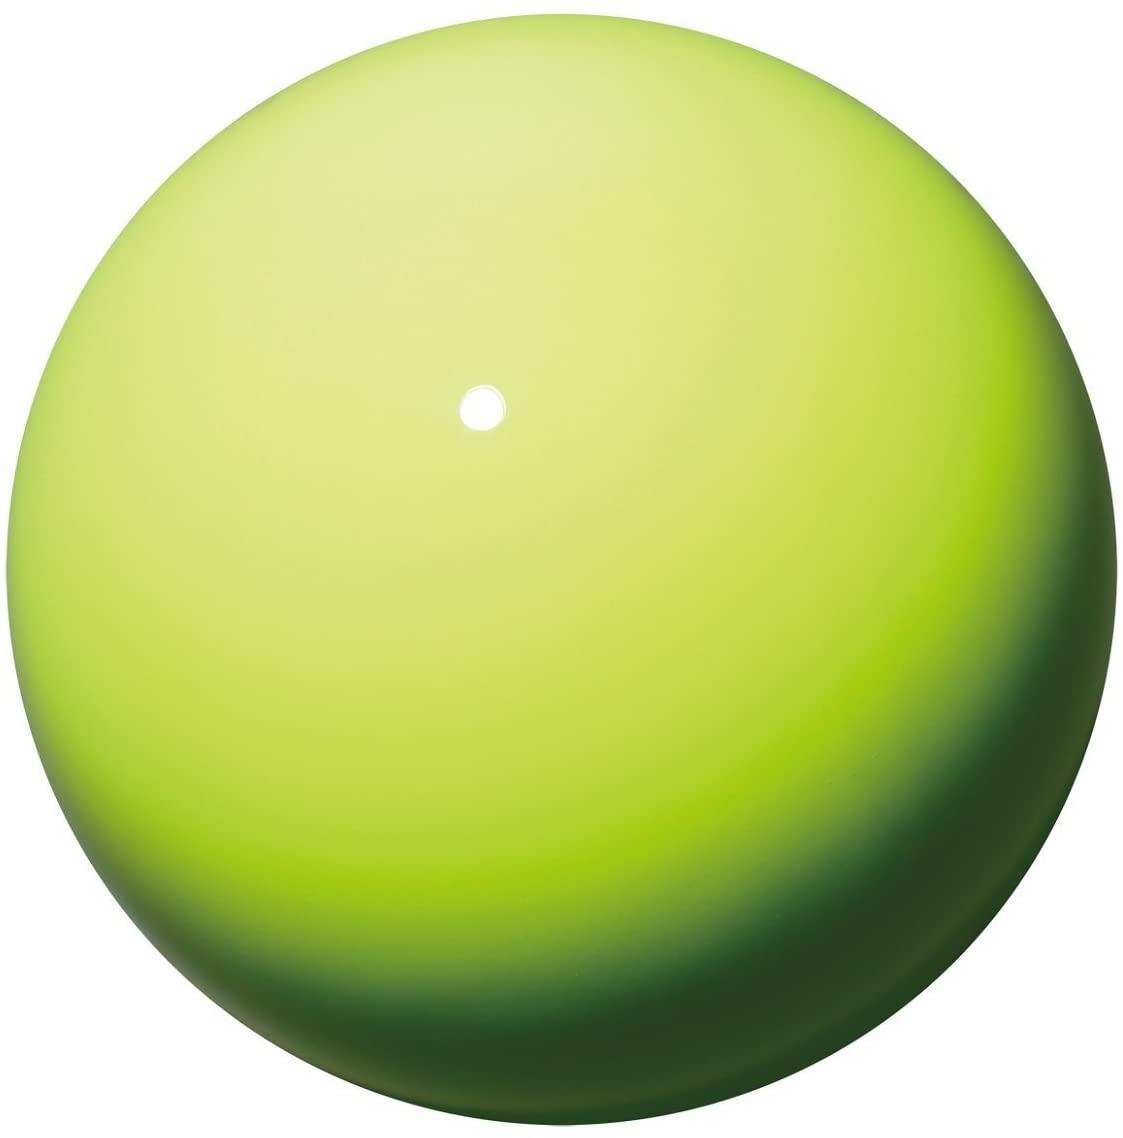 Sasaki - Rhythmic Gymnastics - Gymstar Balls - 10 Colors - M-20A - Made in Japan